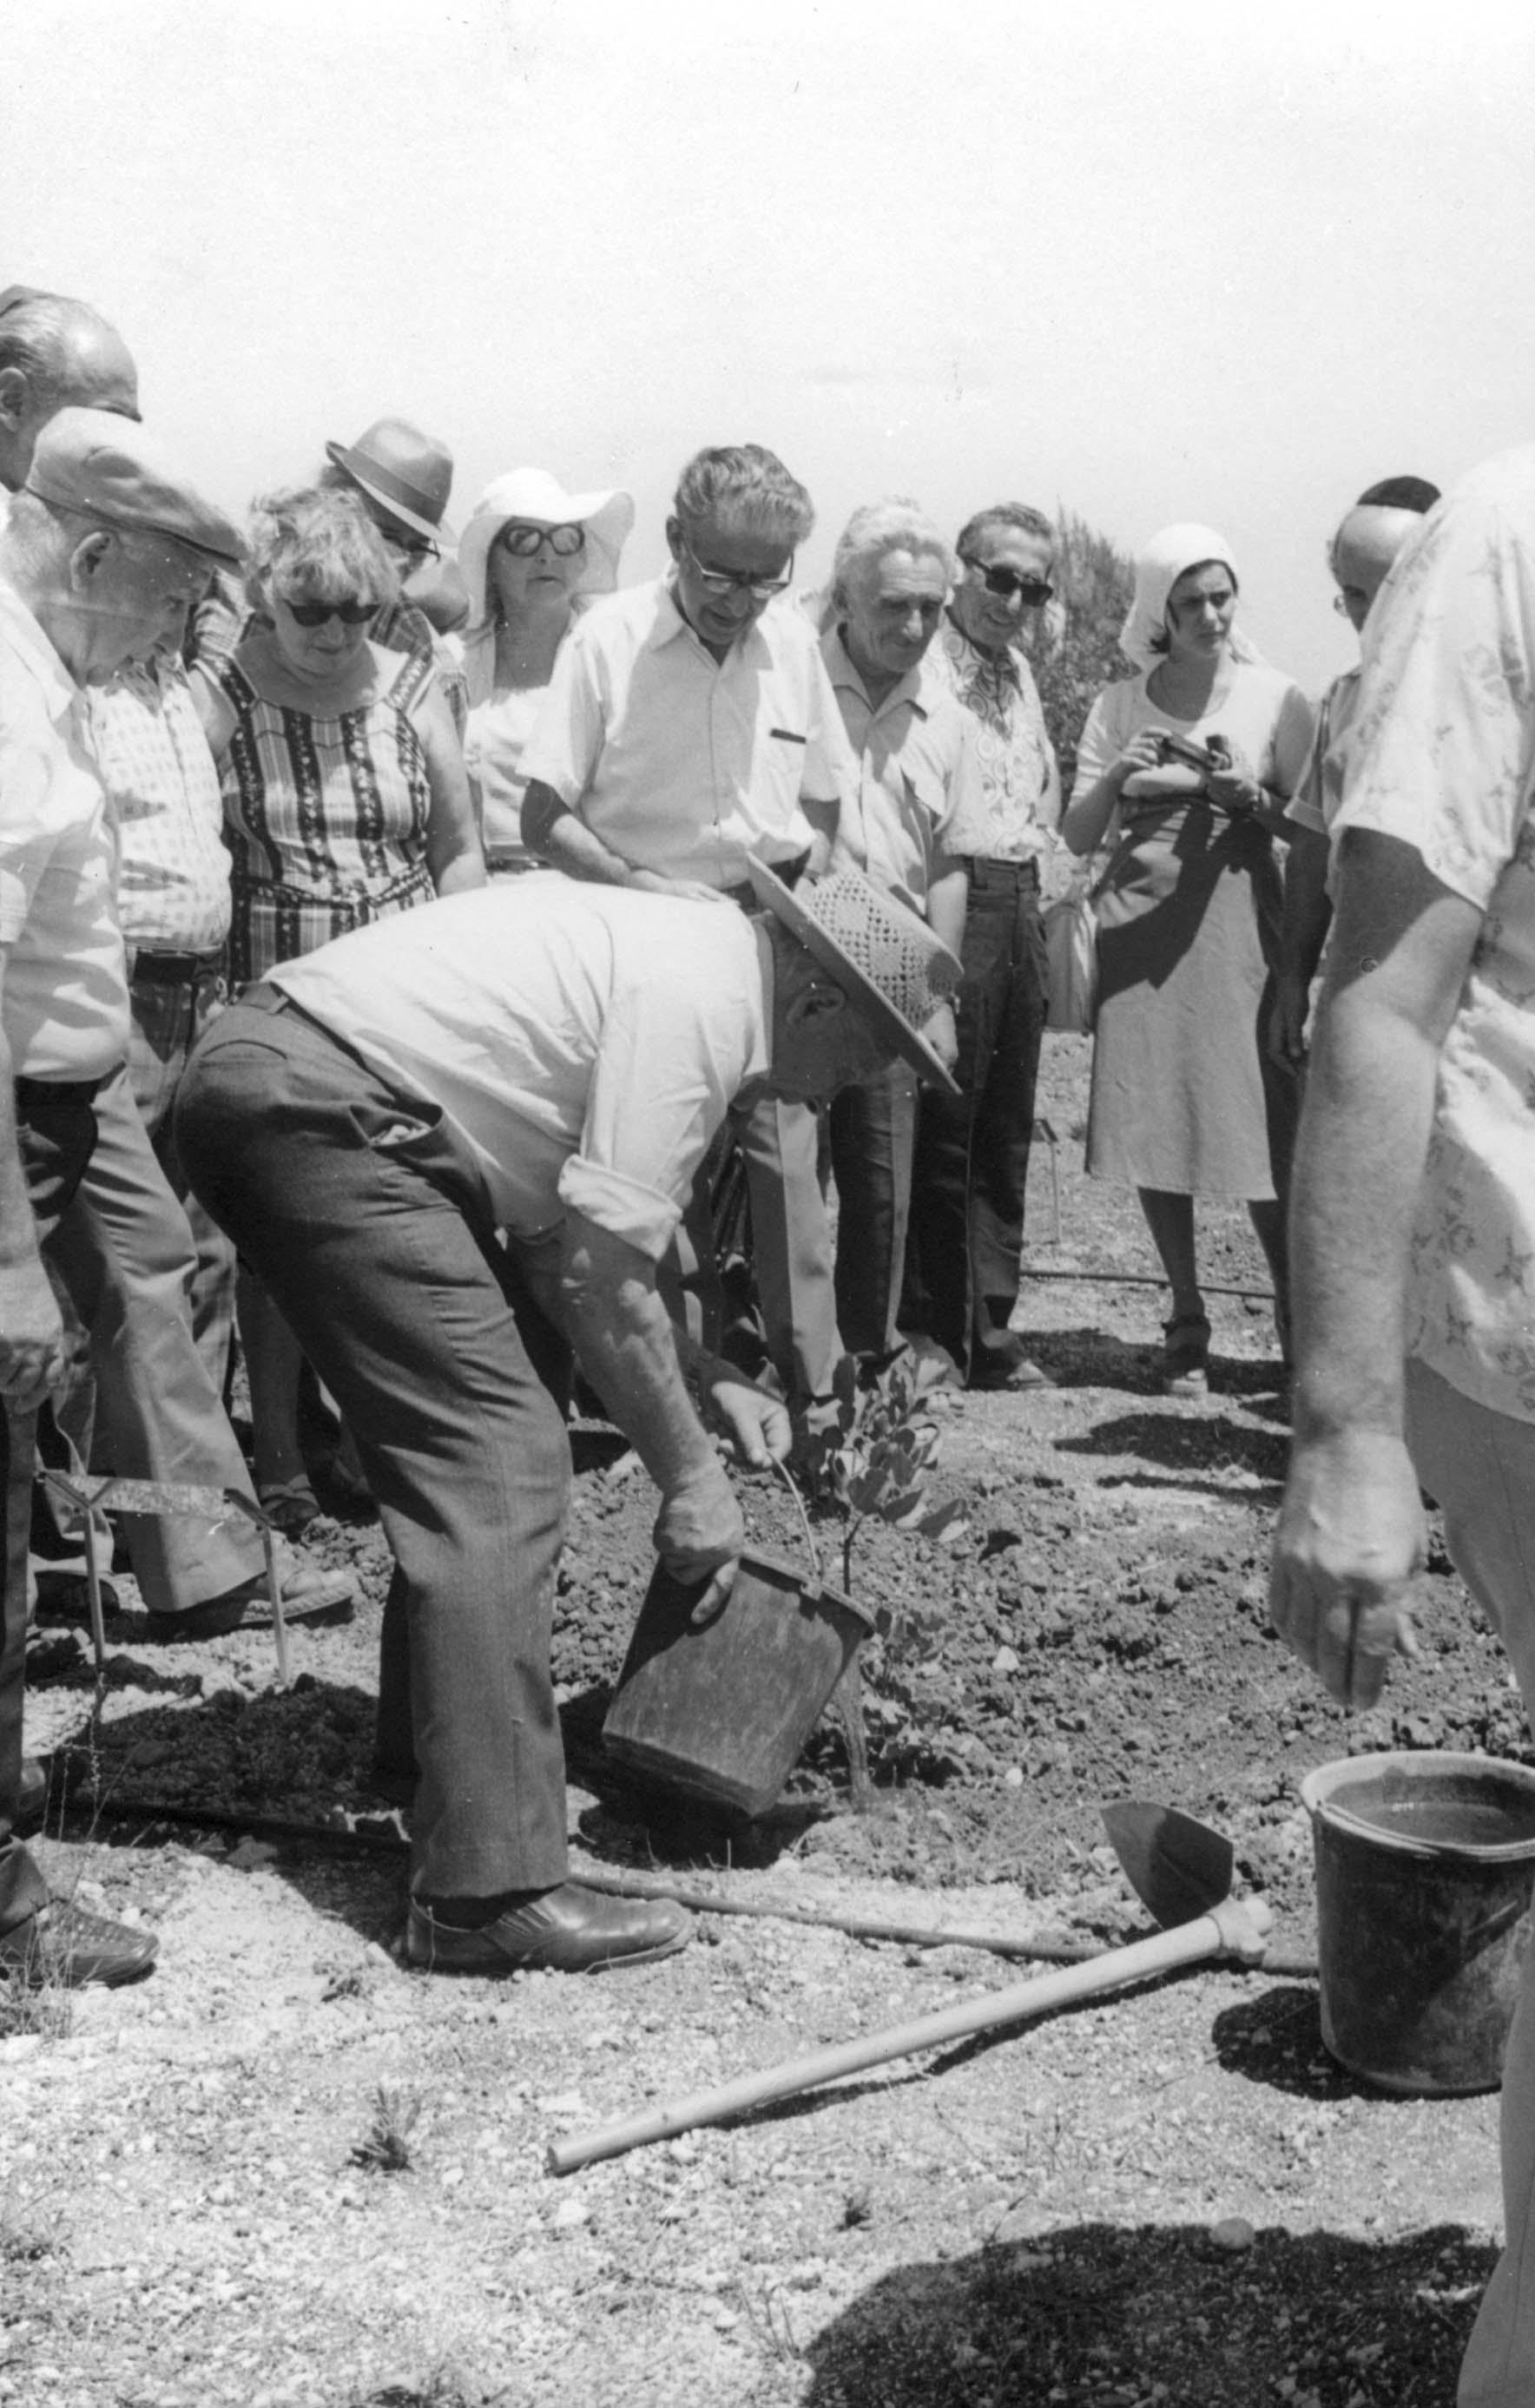 Planting the tree in honour of Janis and Johana Lipke, August 25, 1977